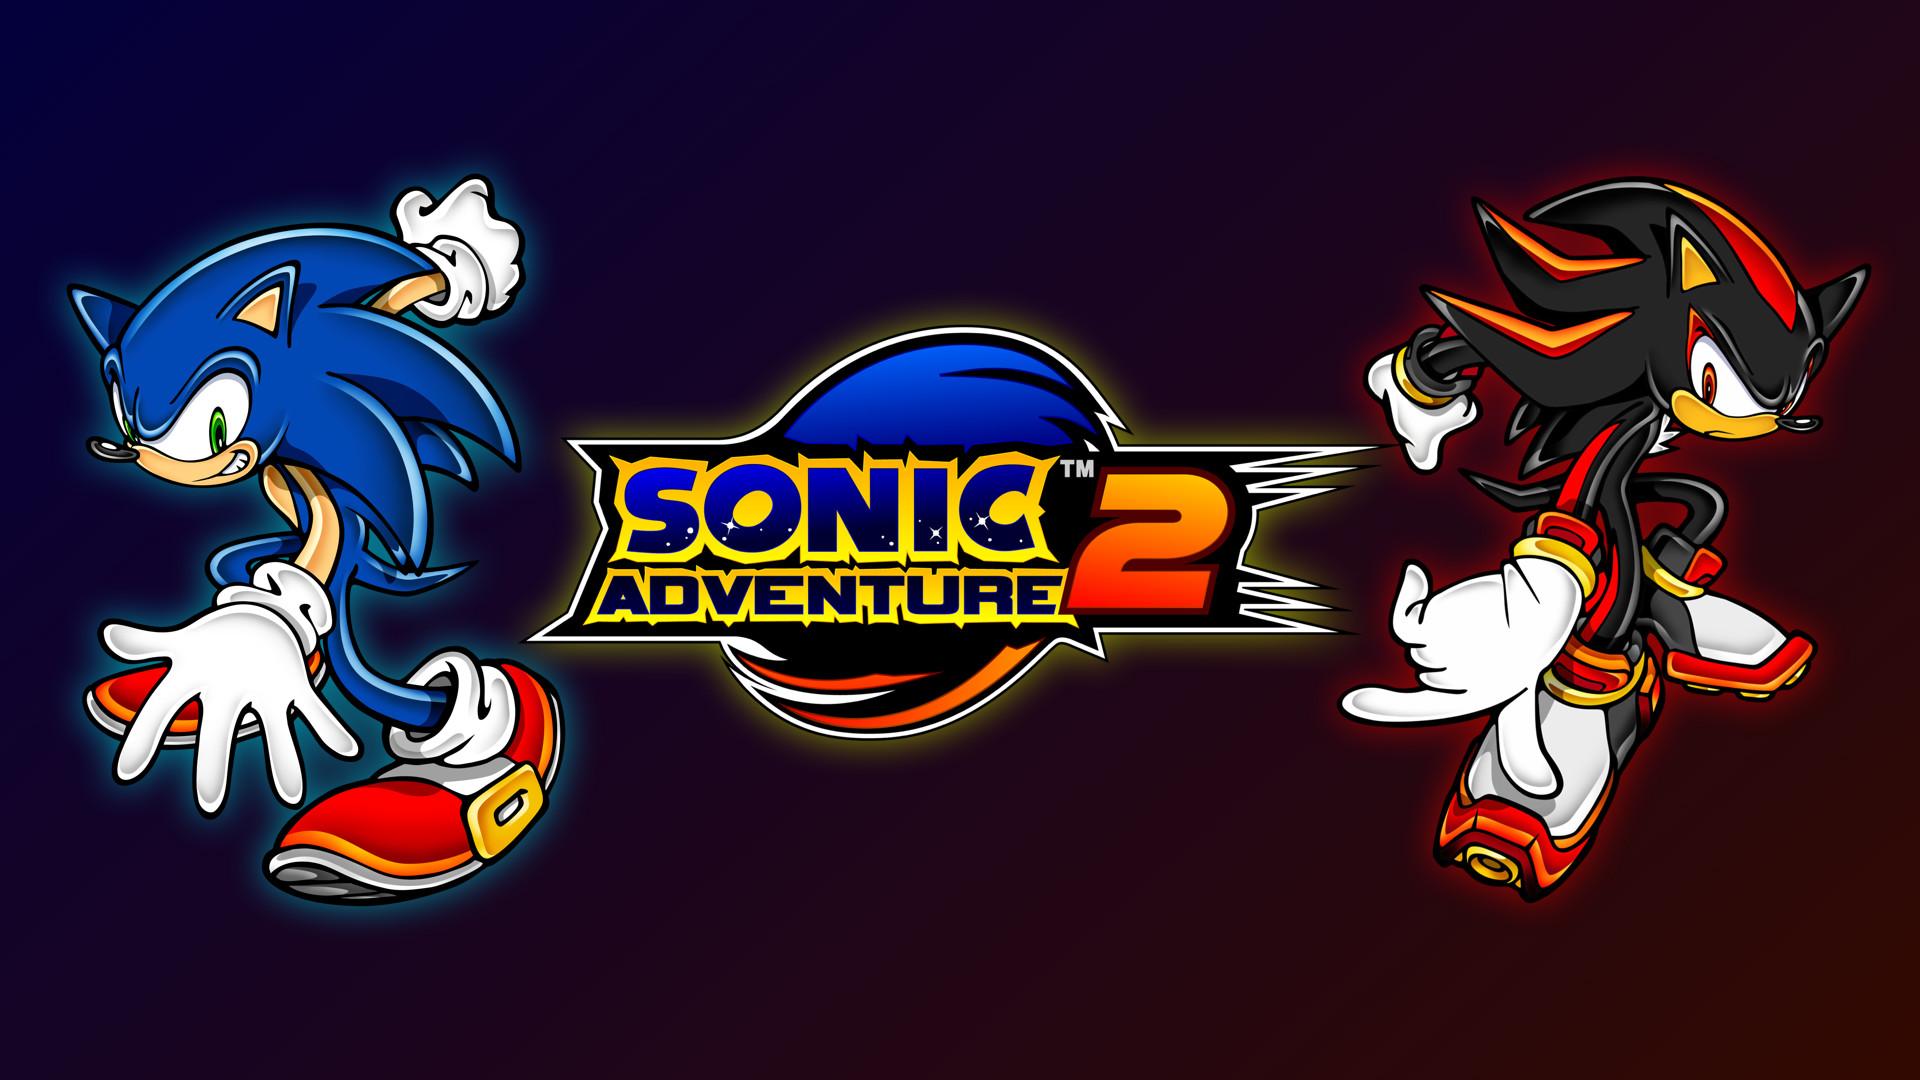 Sonic Adventure 2 Wallpaper by mrcartires on DeviantArt